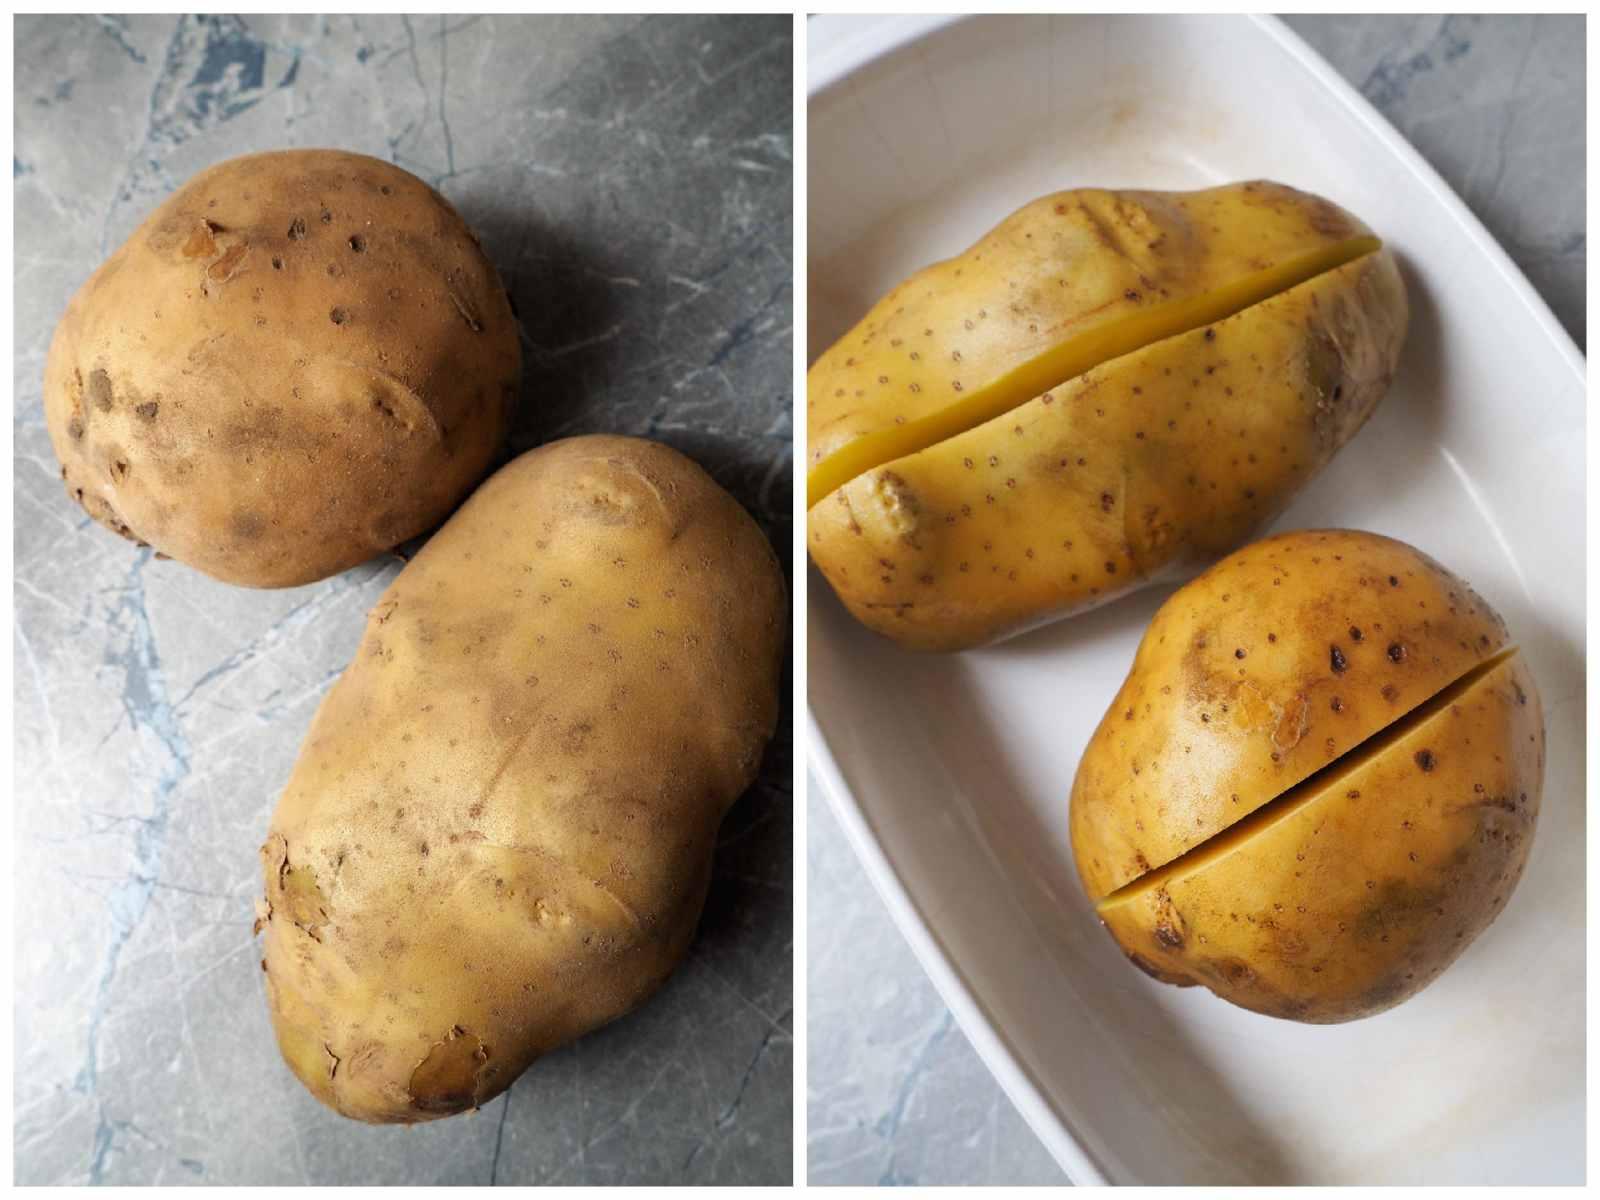 Vegane Kumpir mit Couscous-Salat und Dip Kartoffeln